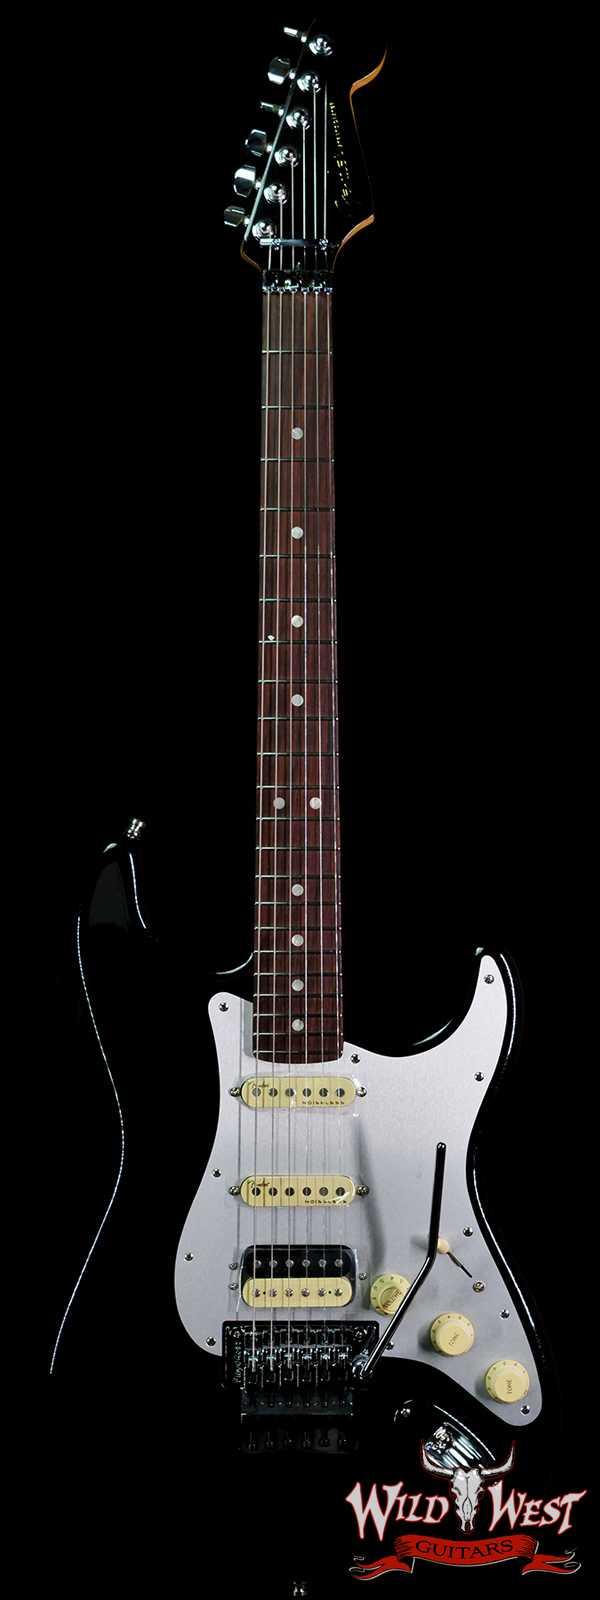 Fender American Ultra Luxe Stratocaster Floyd Rose HSS Rosewood Fingerboard Mystic Black (Blemish)